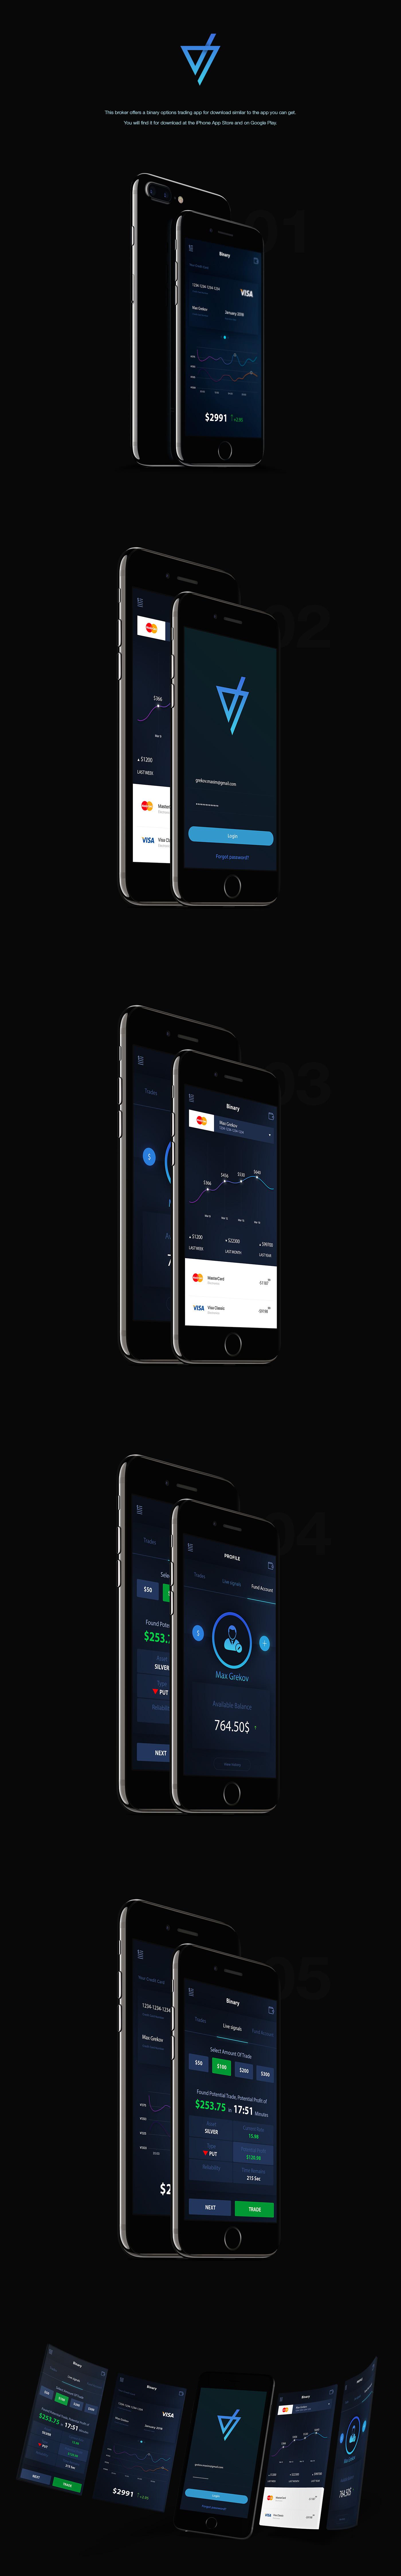 Binary Trade App Design UI Kit - Freebie for PSD Designers - Download Link